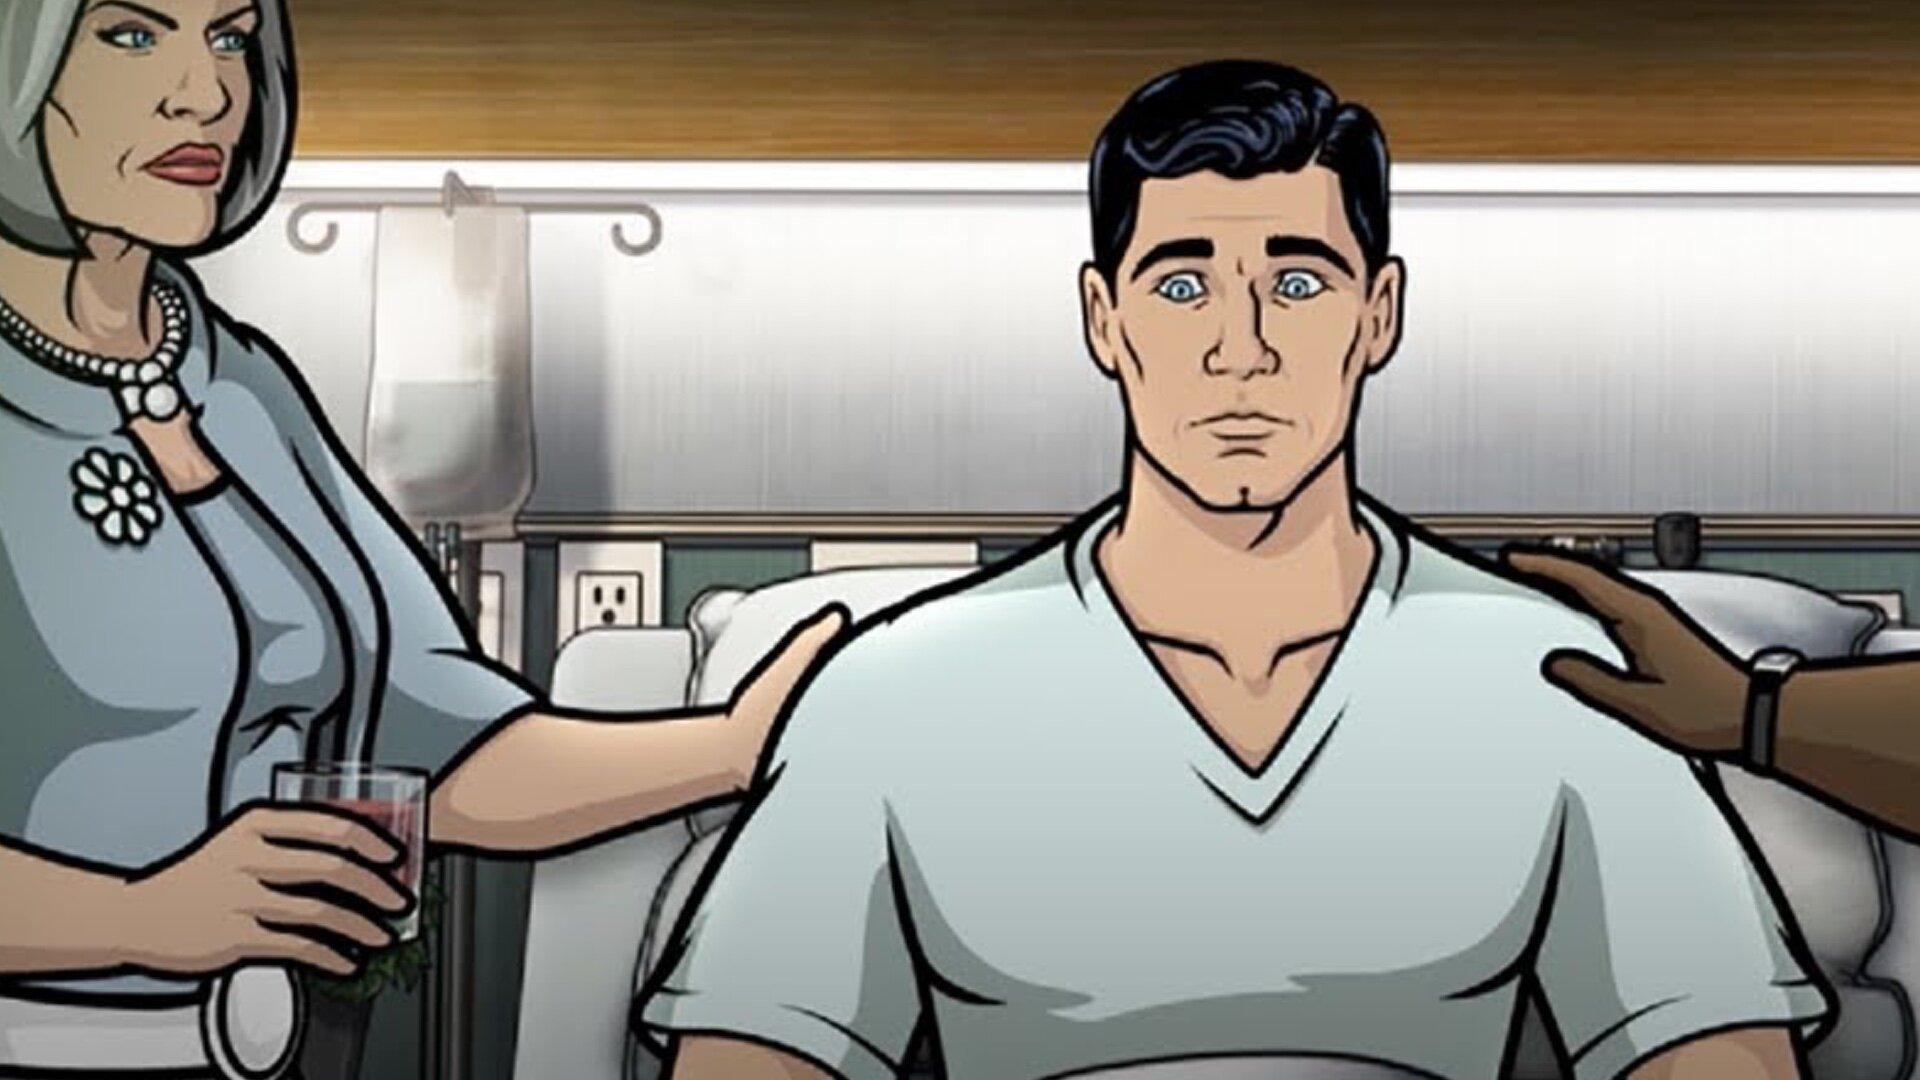 FX Announces the Premiere Date of ARCHER Season 11 — GeekTyrant